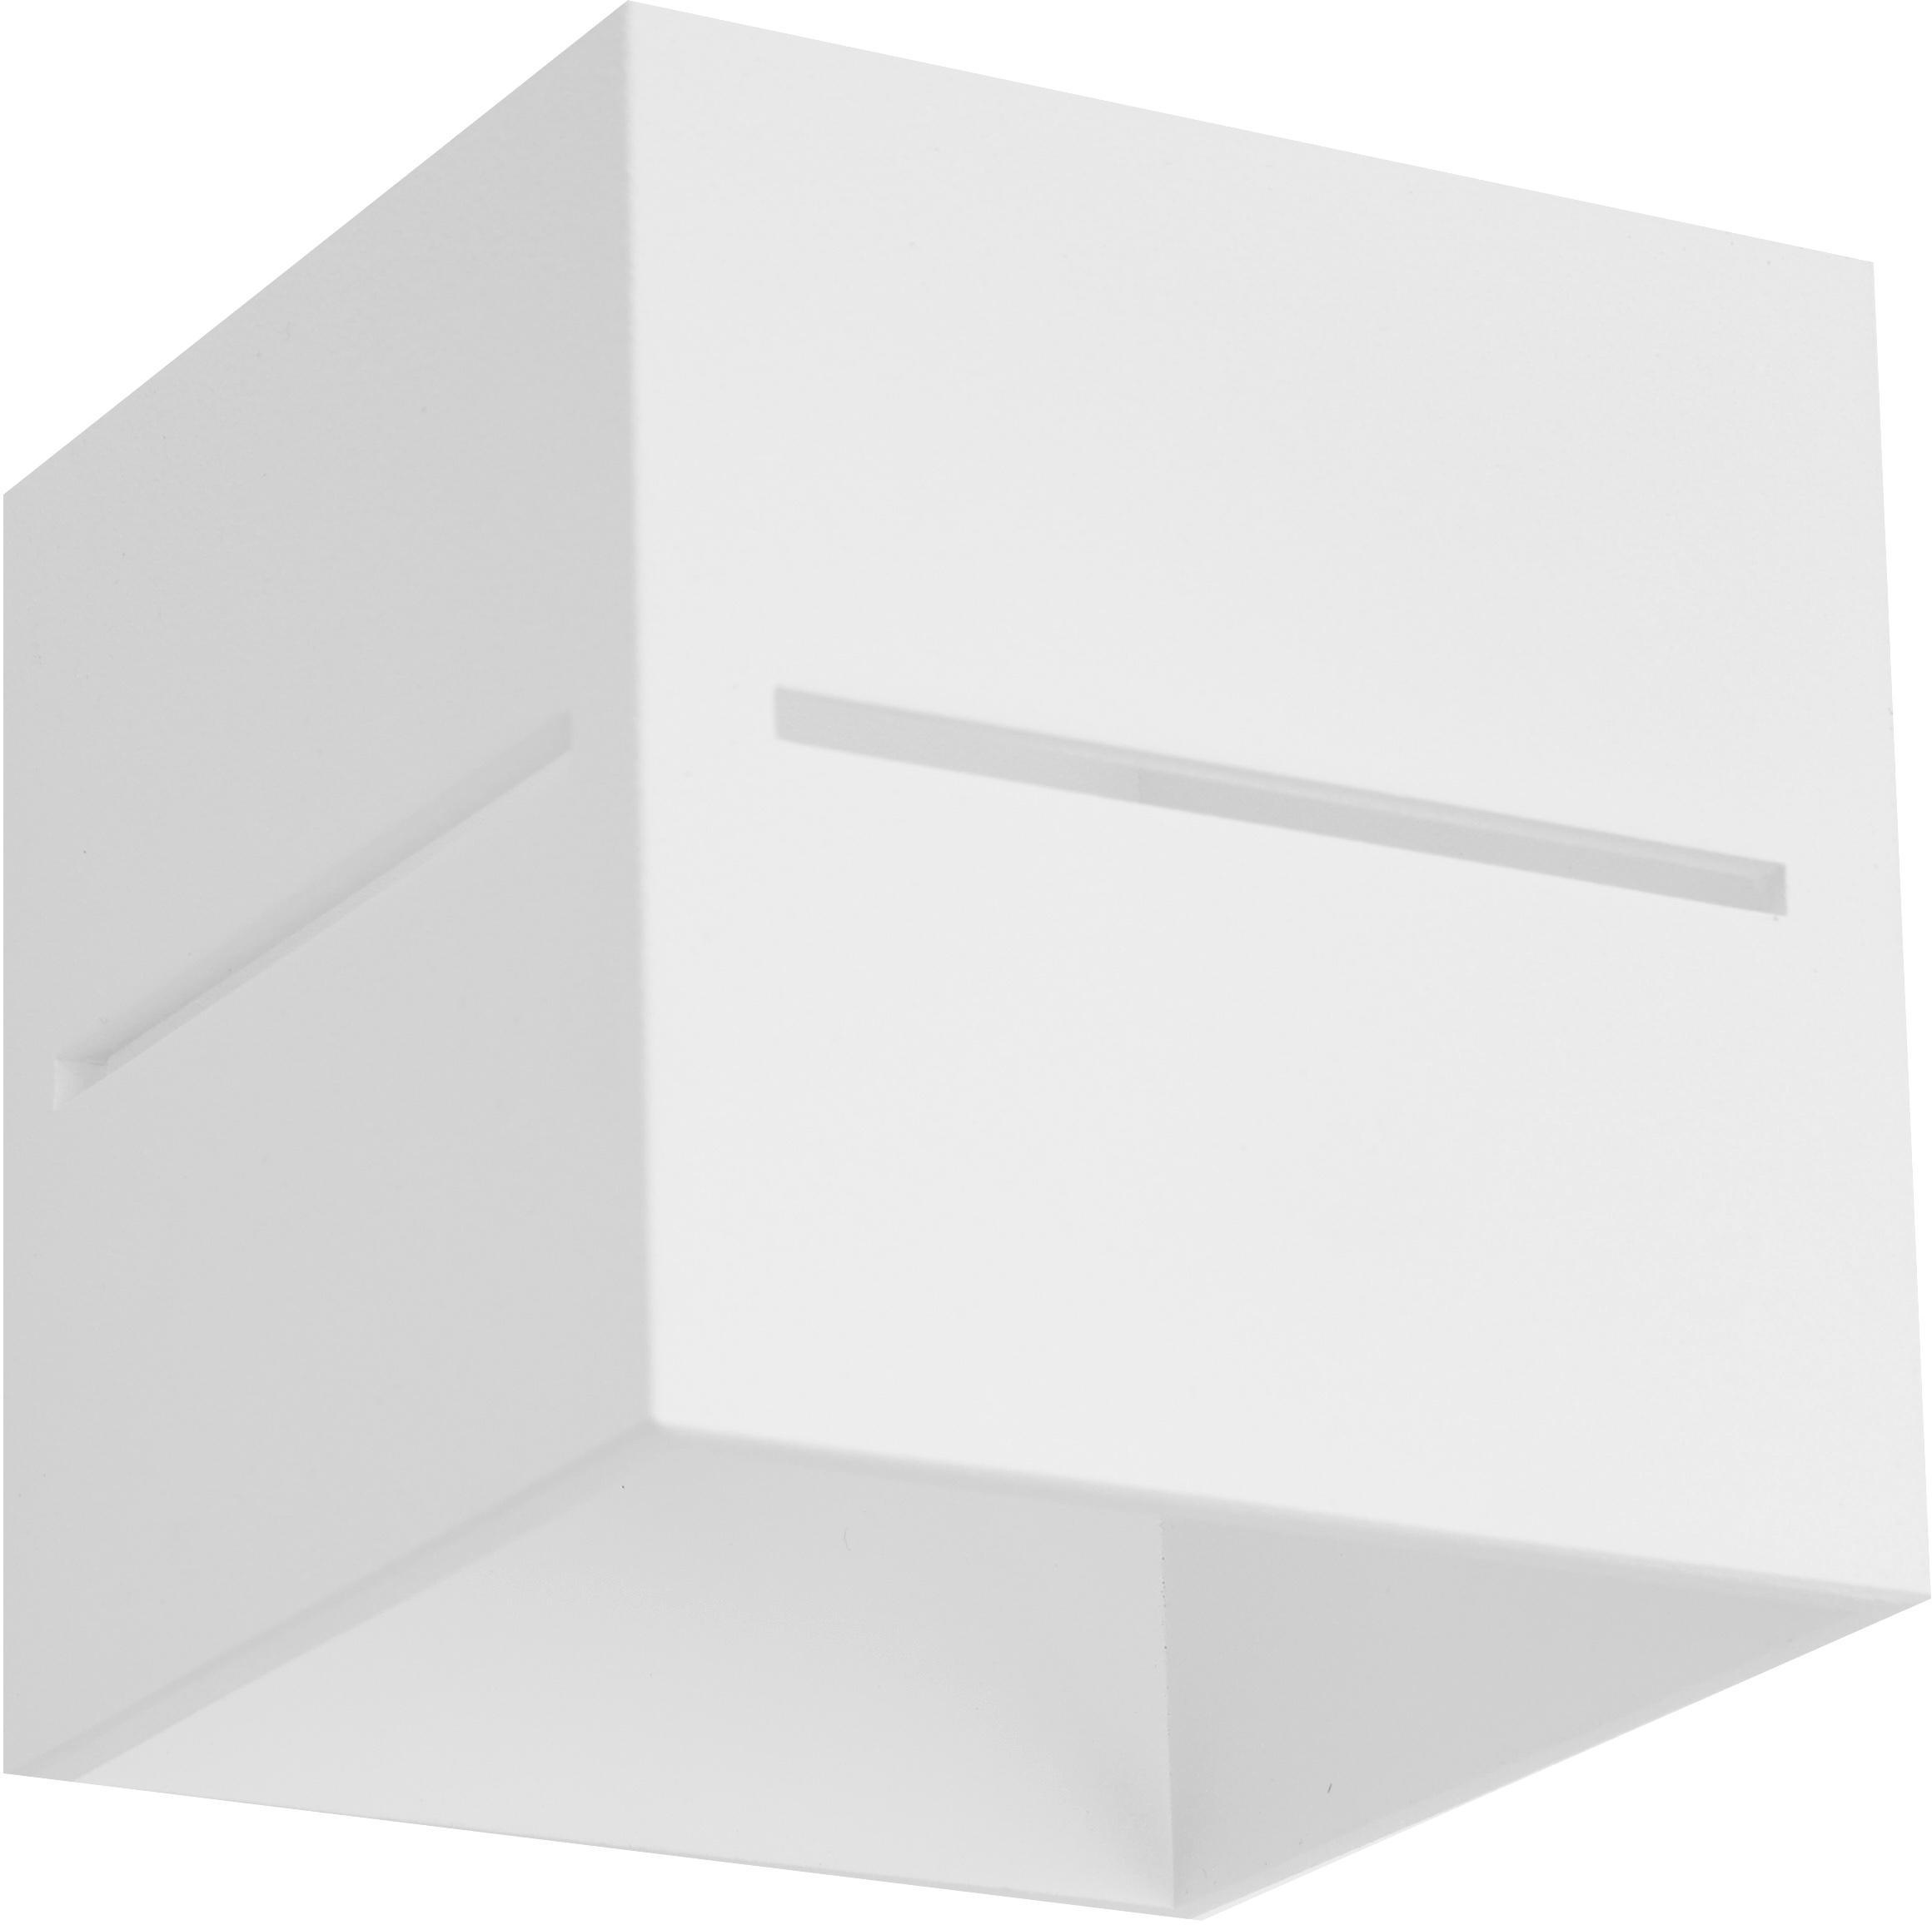 Wandleuchte Lorum, Aluminium, Weiß, 10 x 10 cm